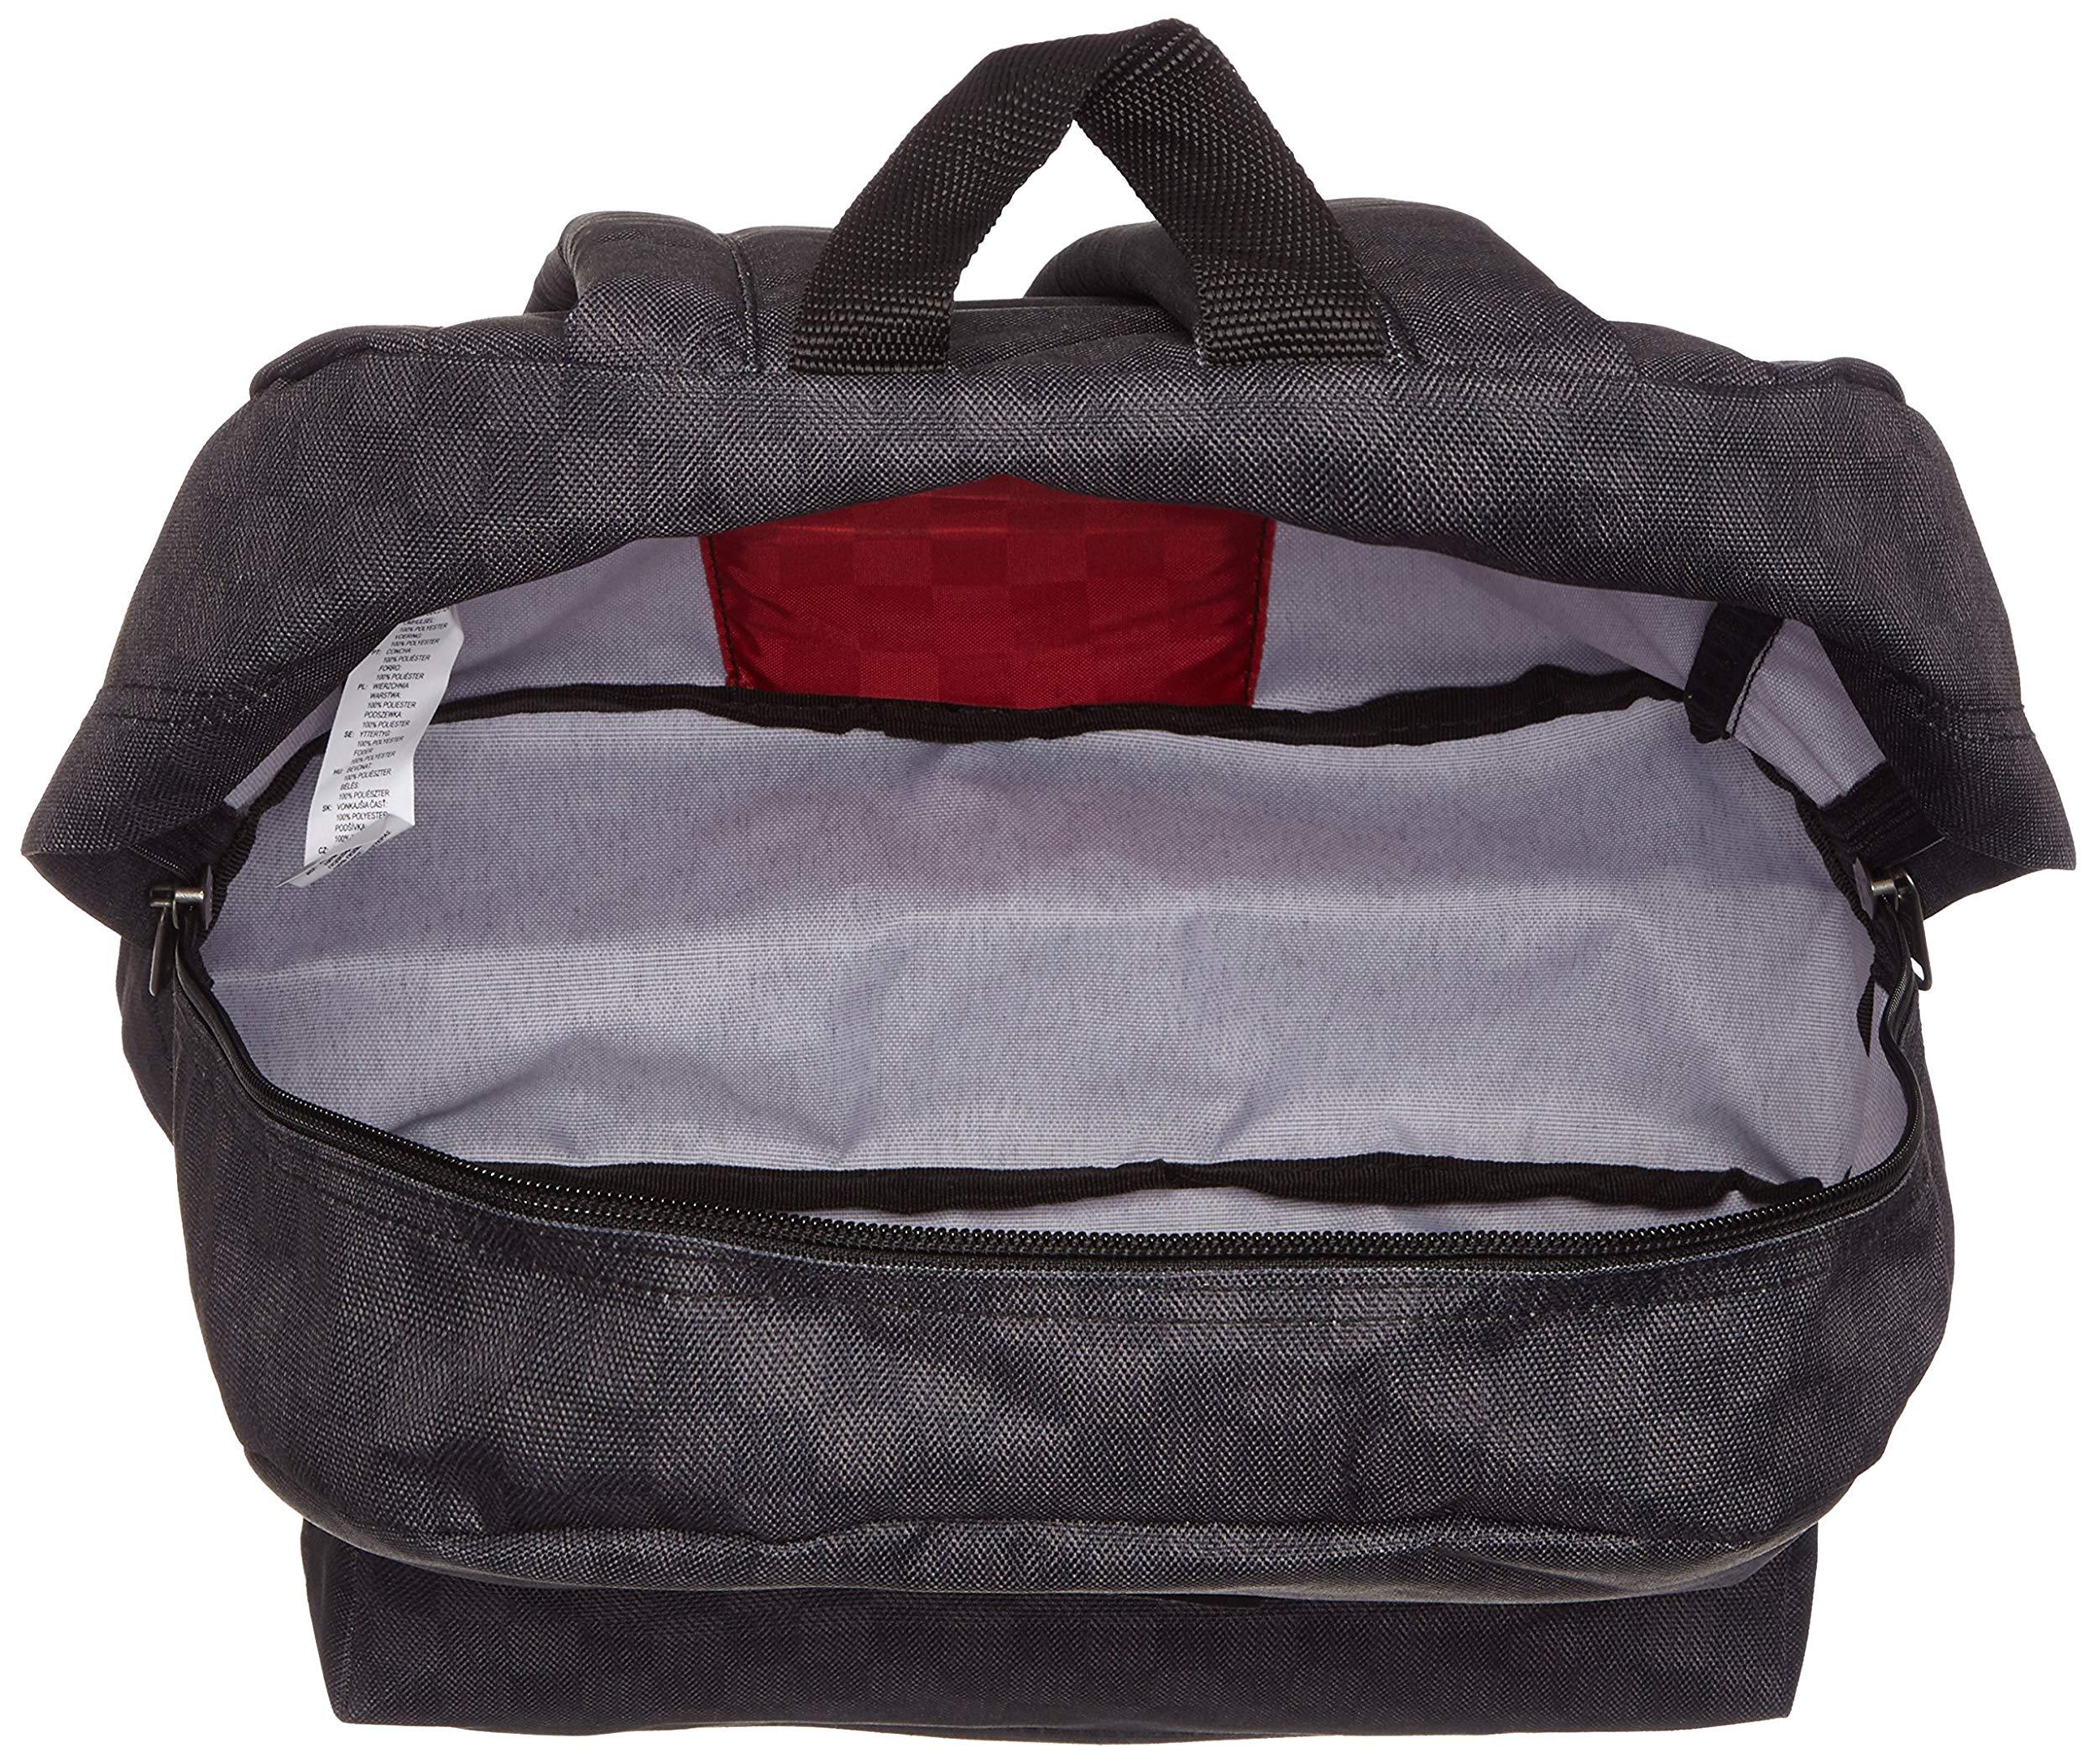 ce0d0f03873b Click on the Image to Enlarge. More Details. VANS Old Skool II Checker  Board backpack ...